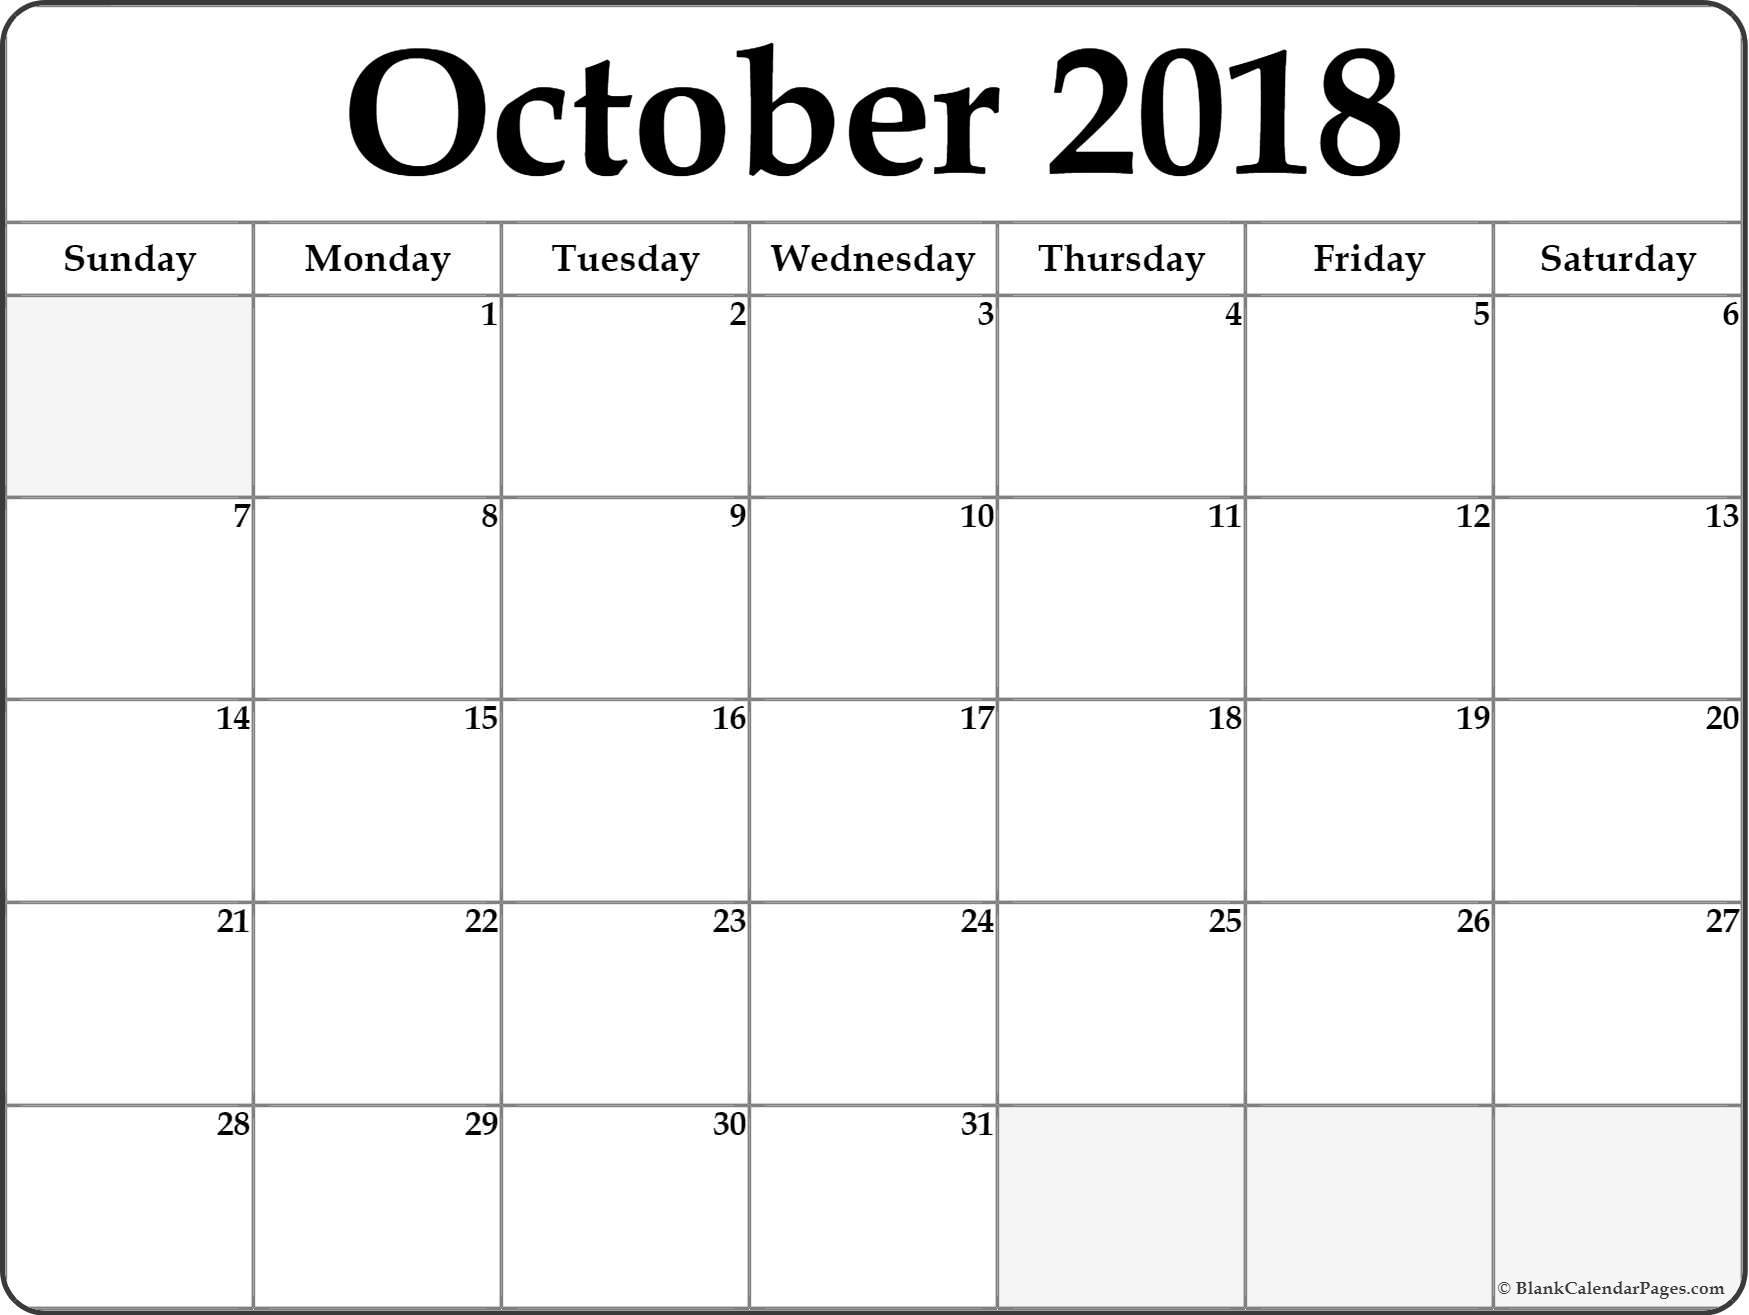 october 2018 calendar b4